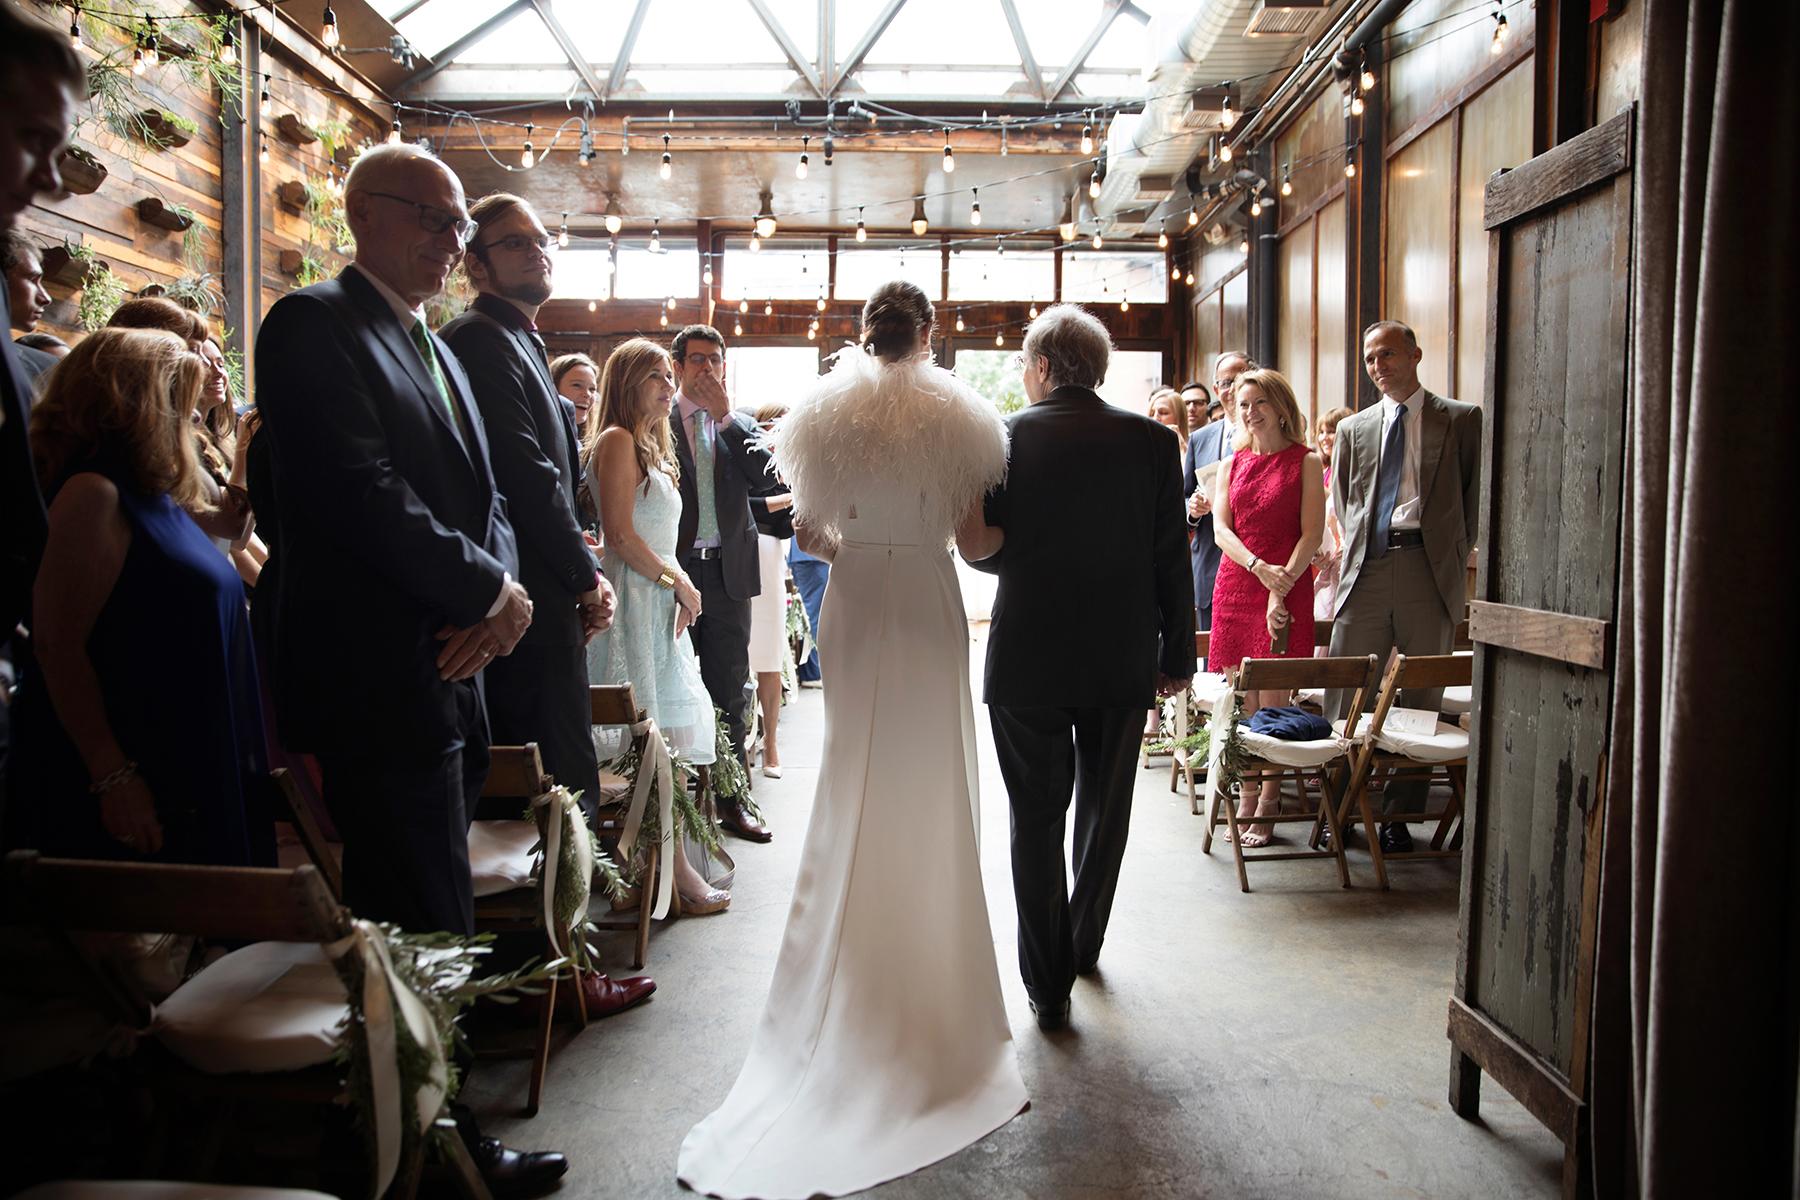 raquelreis_wedding_photography_brooklynwinery_025.jpg